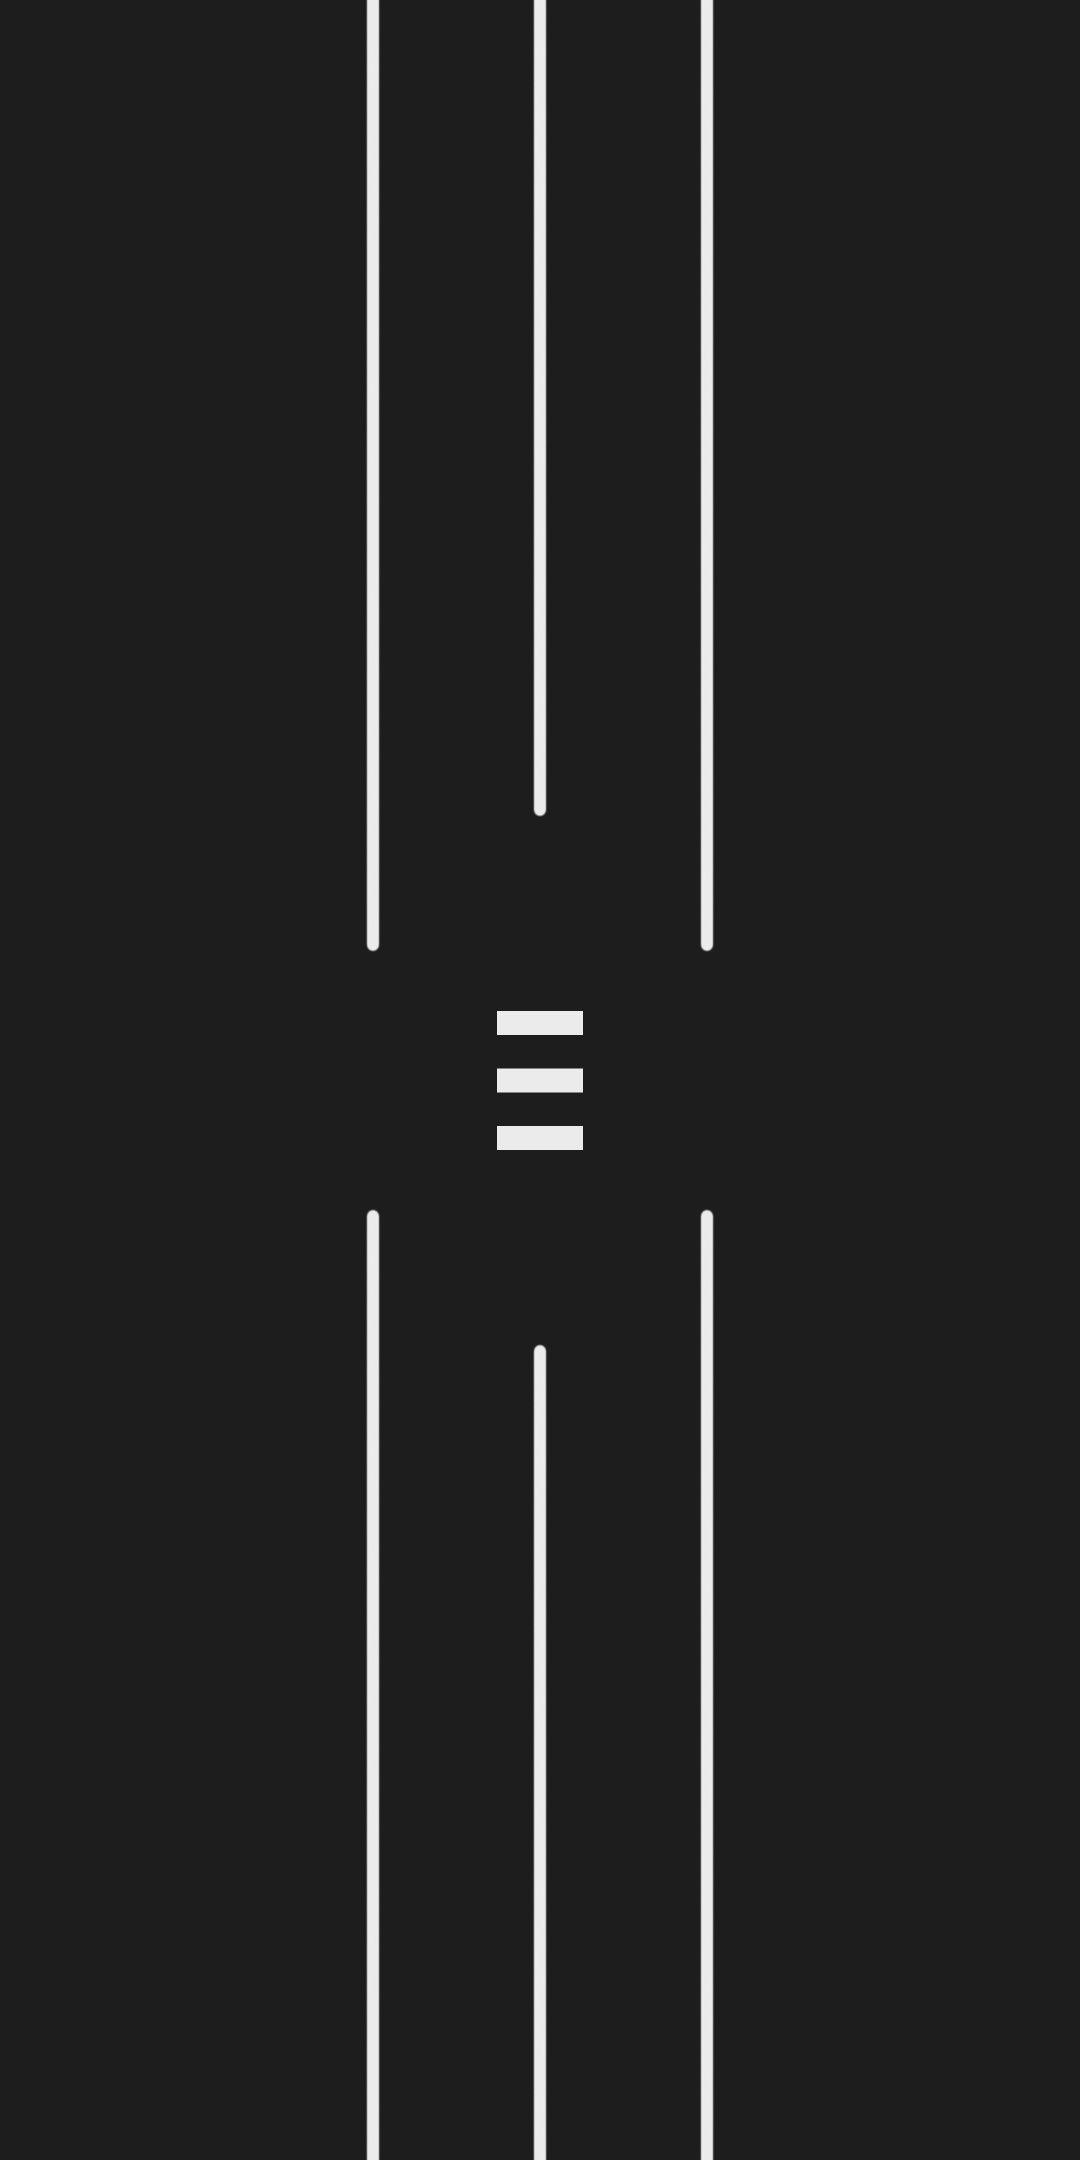 Dark Lines Minimal 1080x2160 Wallpaper